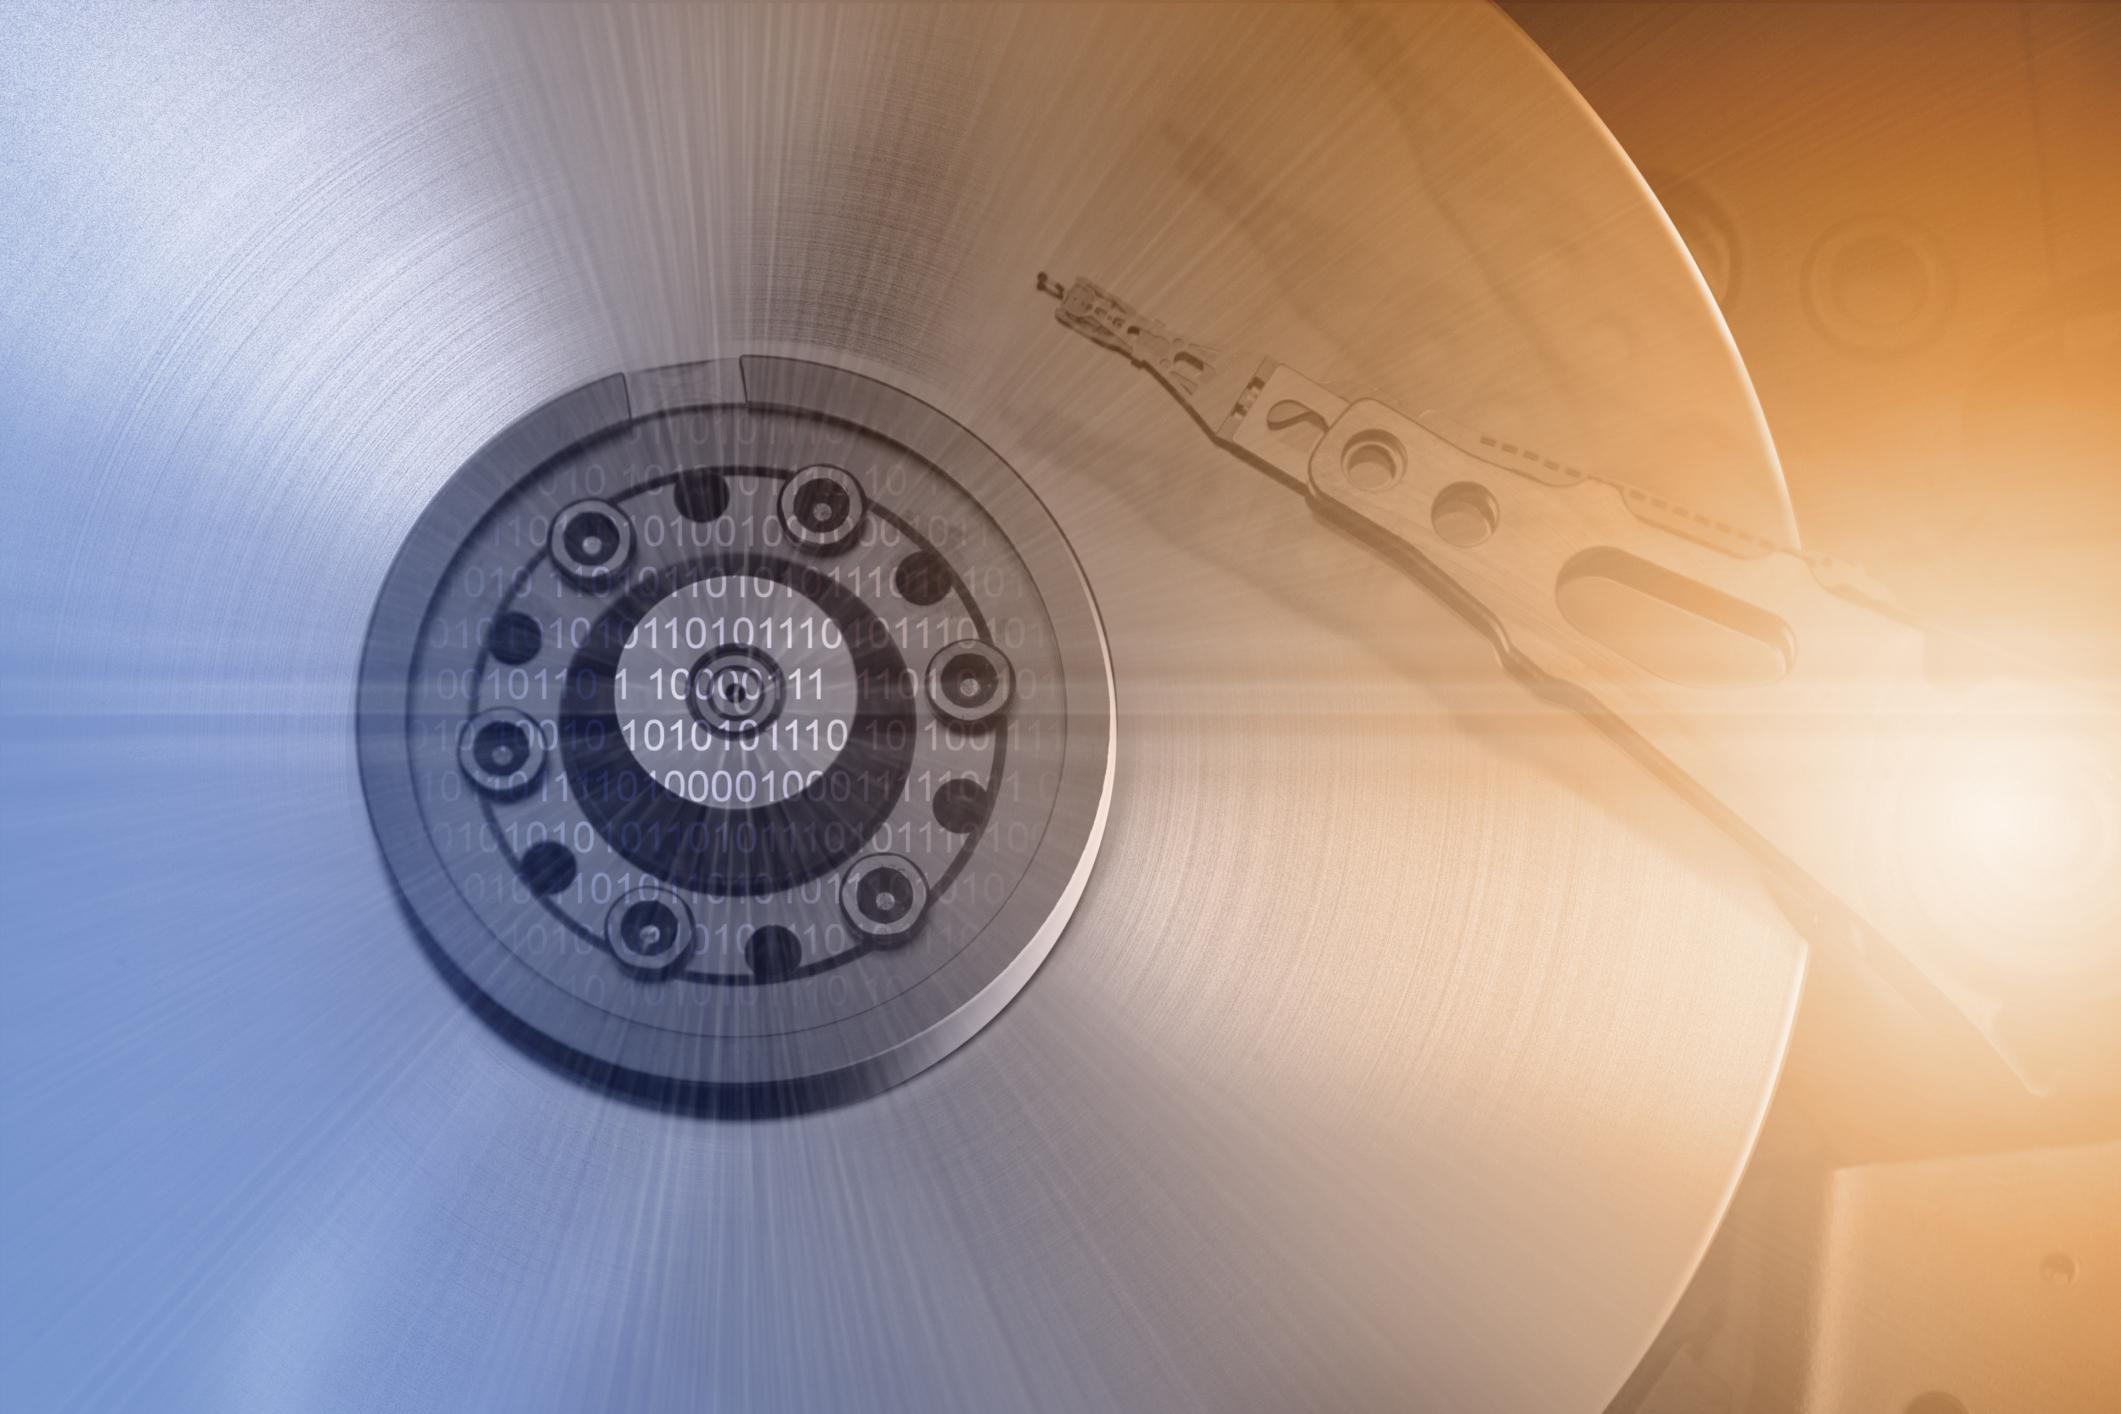 Toshiba Hard Drive Diagnostic Tools